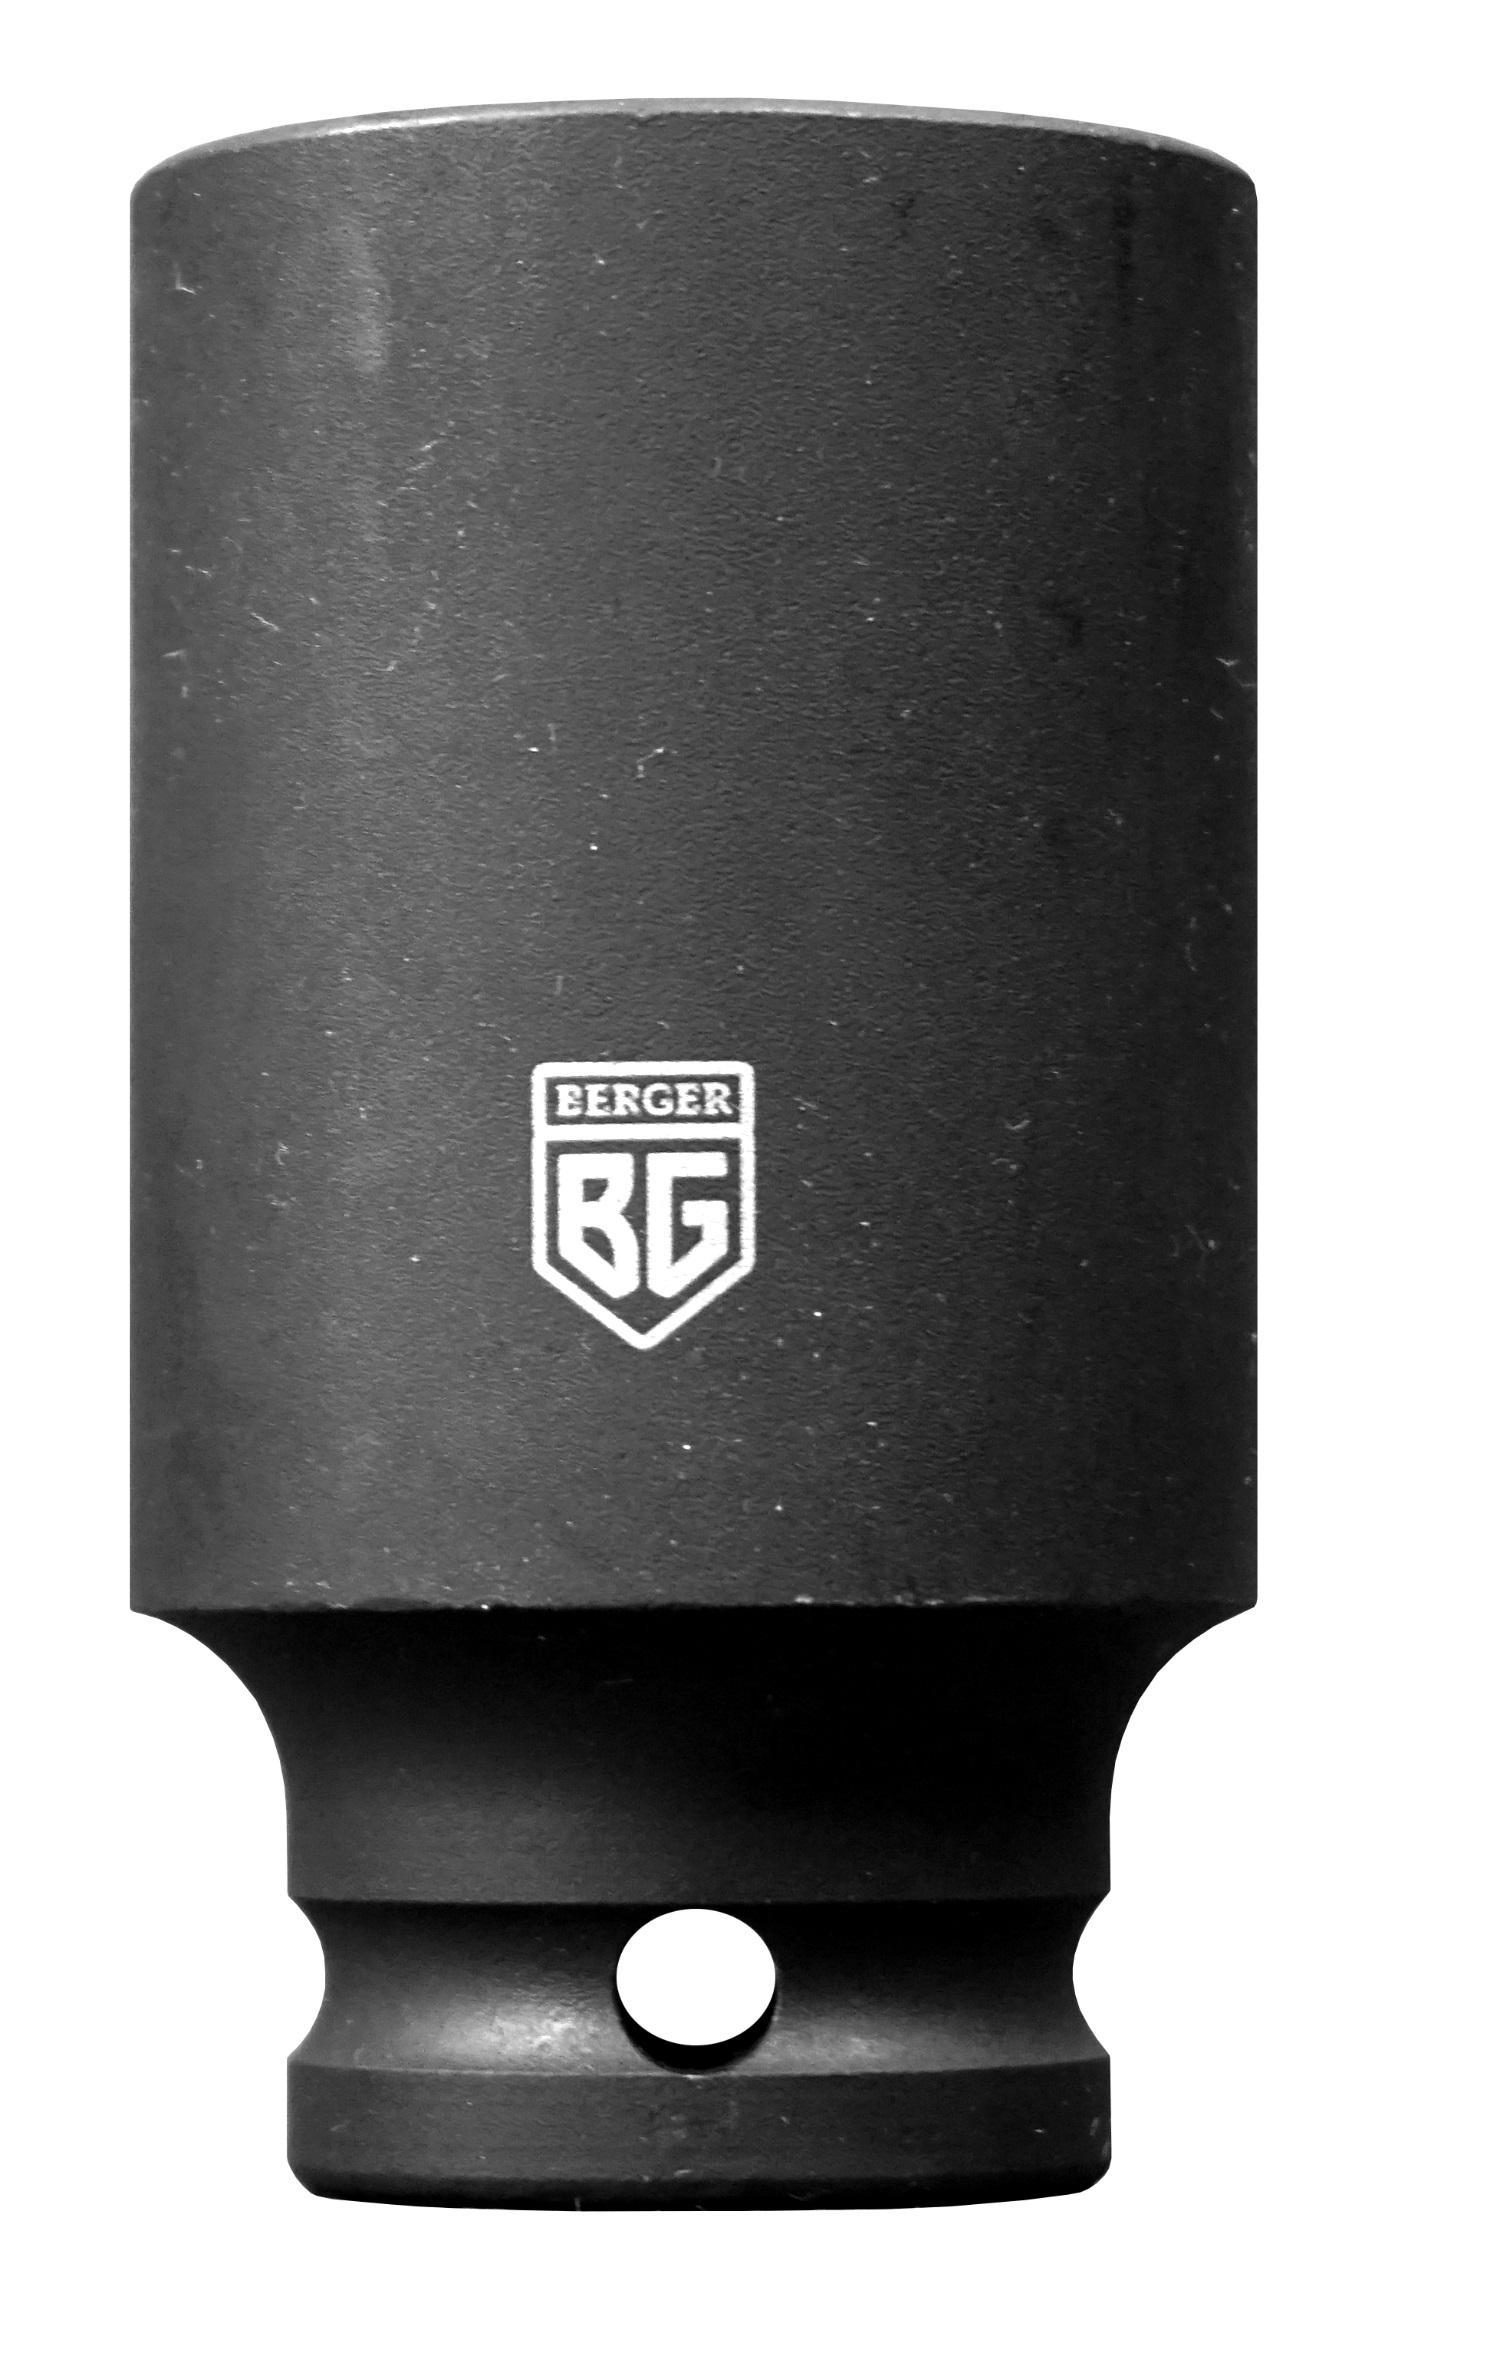 Головка торцевая Berger Bg2146 1/2 30мм торцевая головка ударная berger удлиненная 1 2 30 мм bg2146